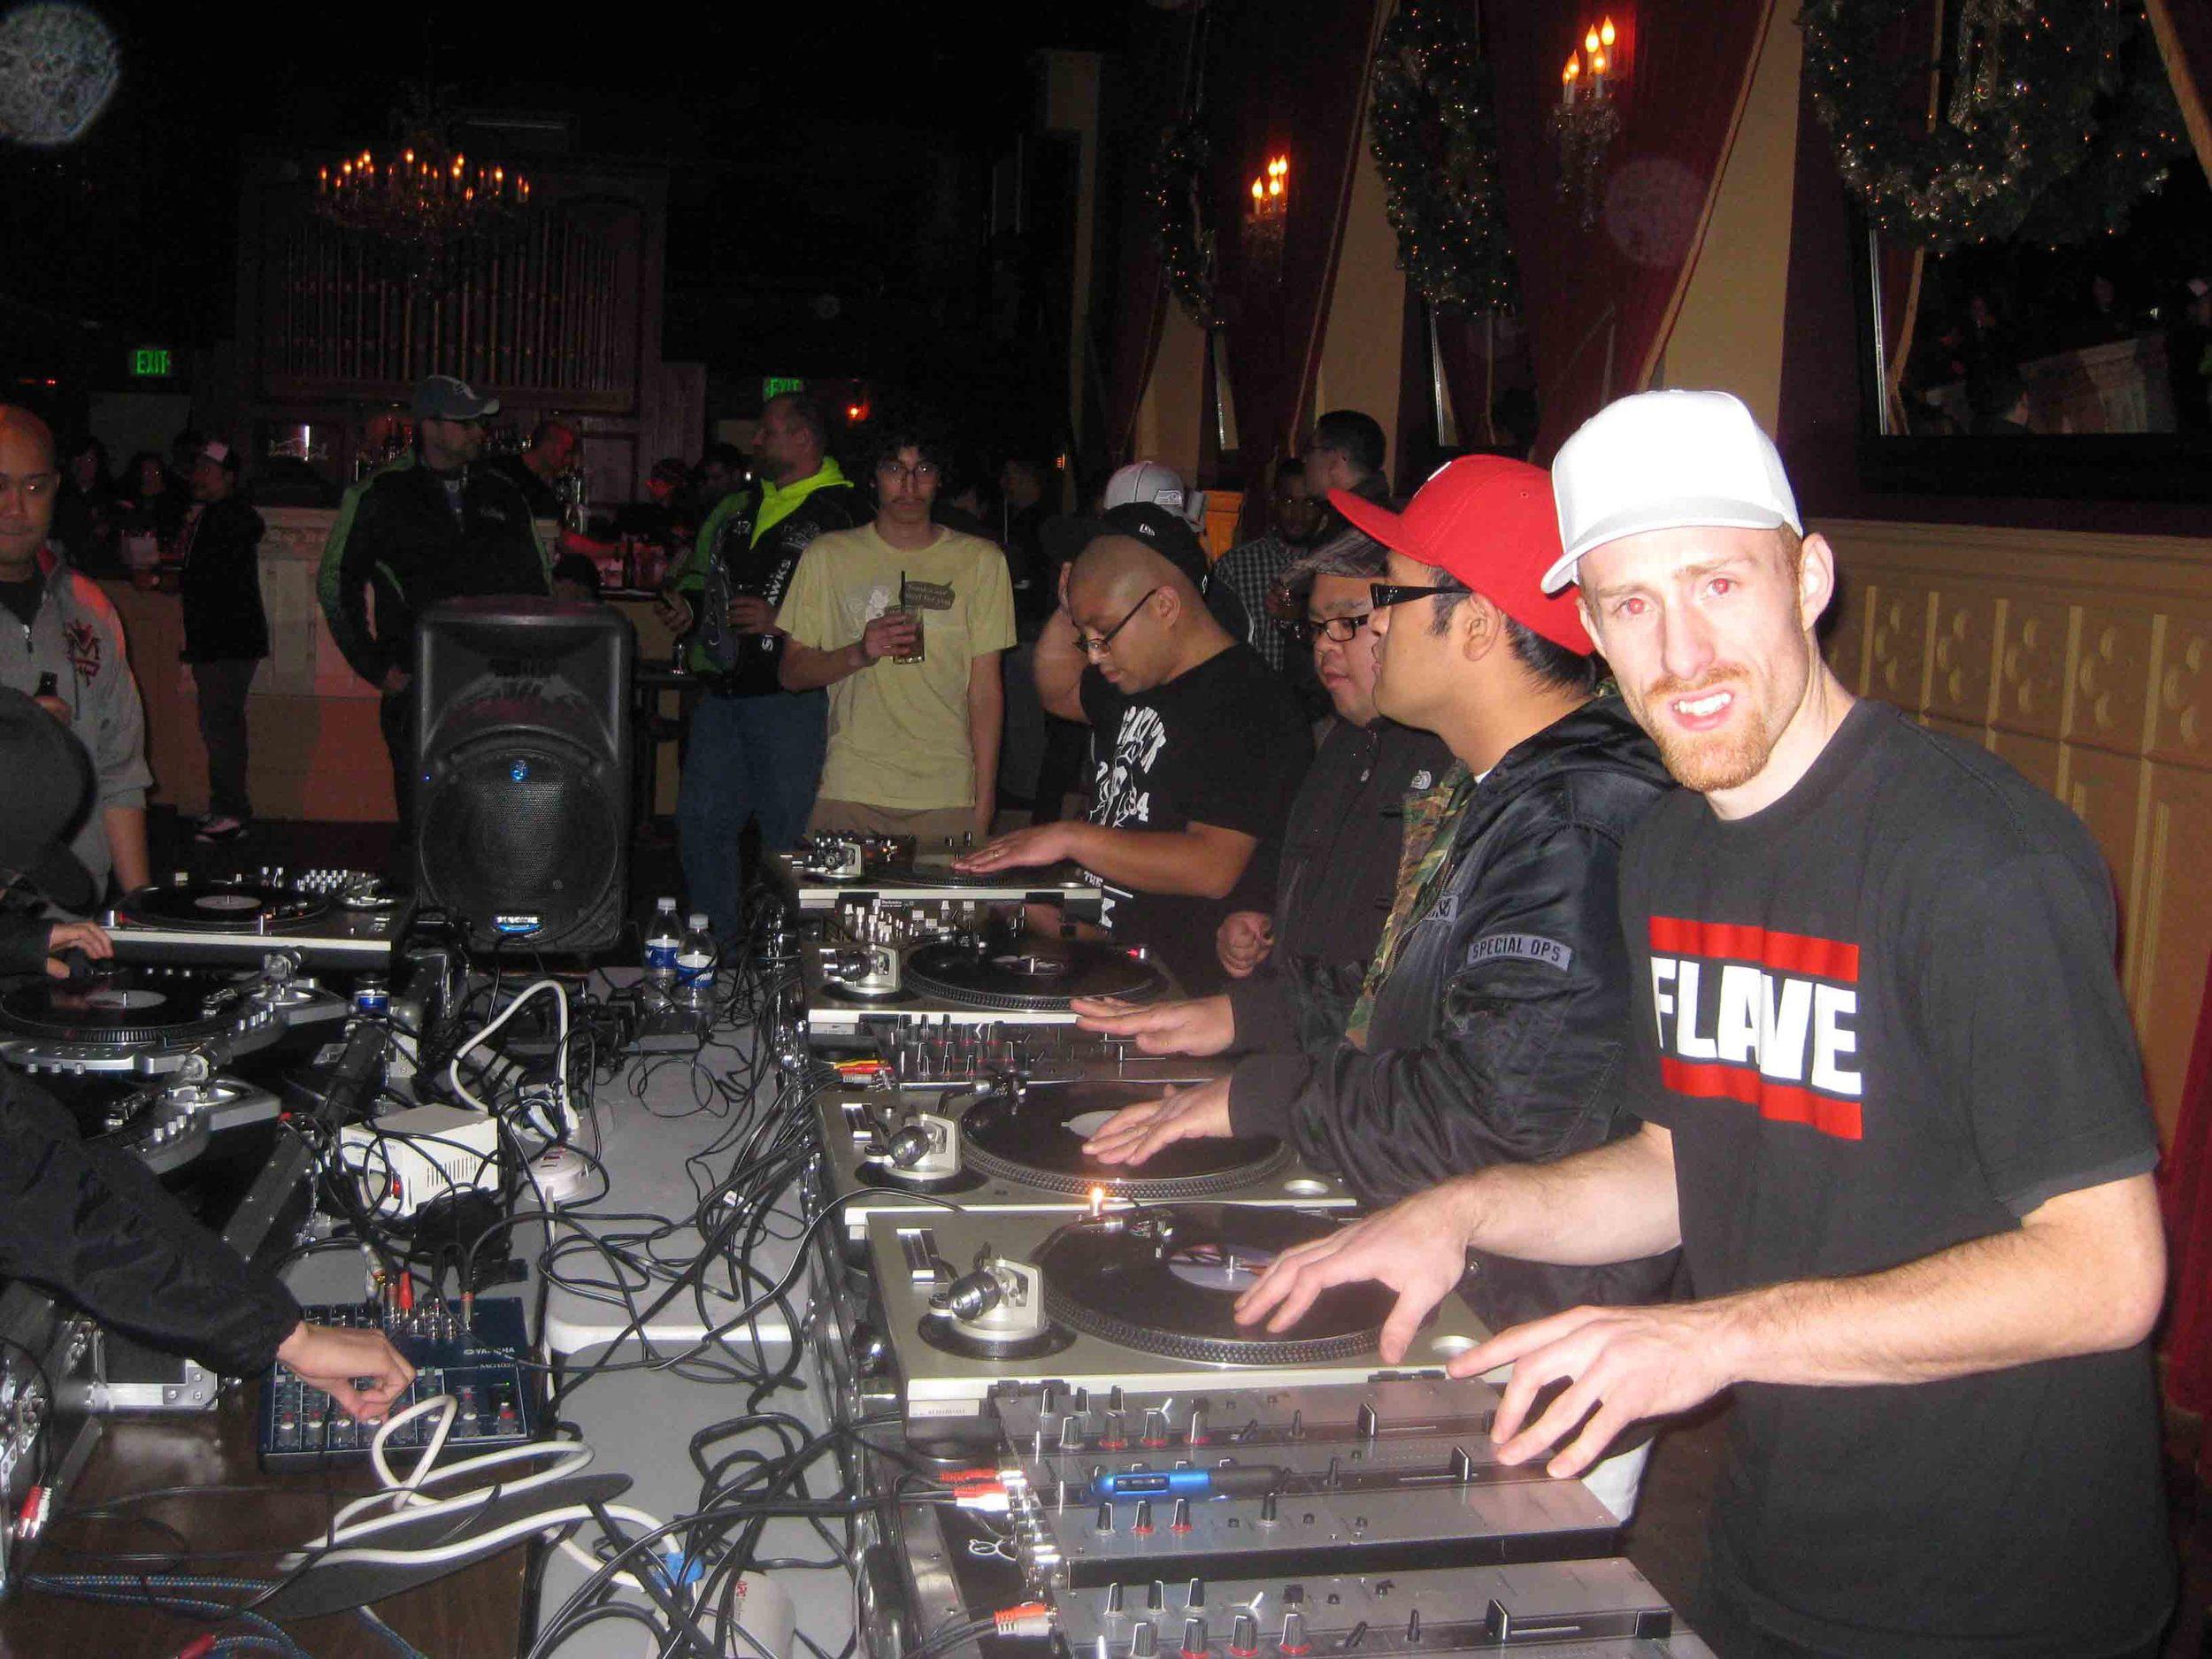 2011_12_01_Skratch Lounge (Tre & Shmix) (3).jpg